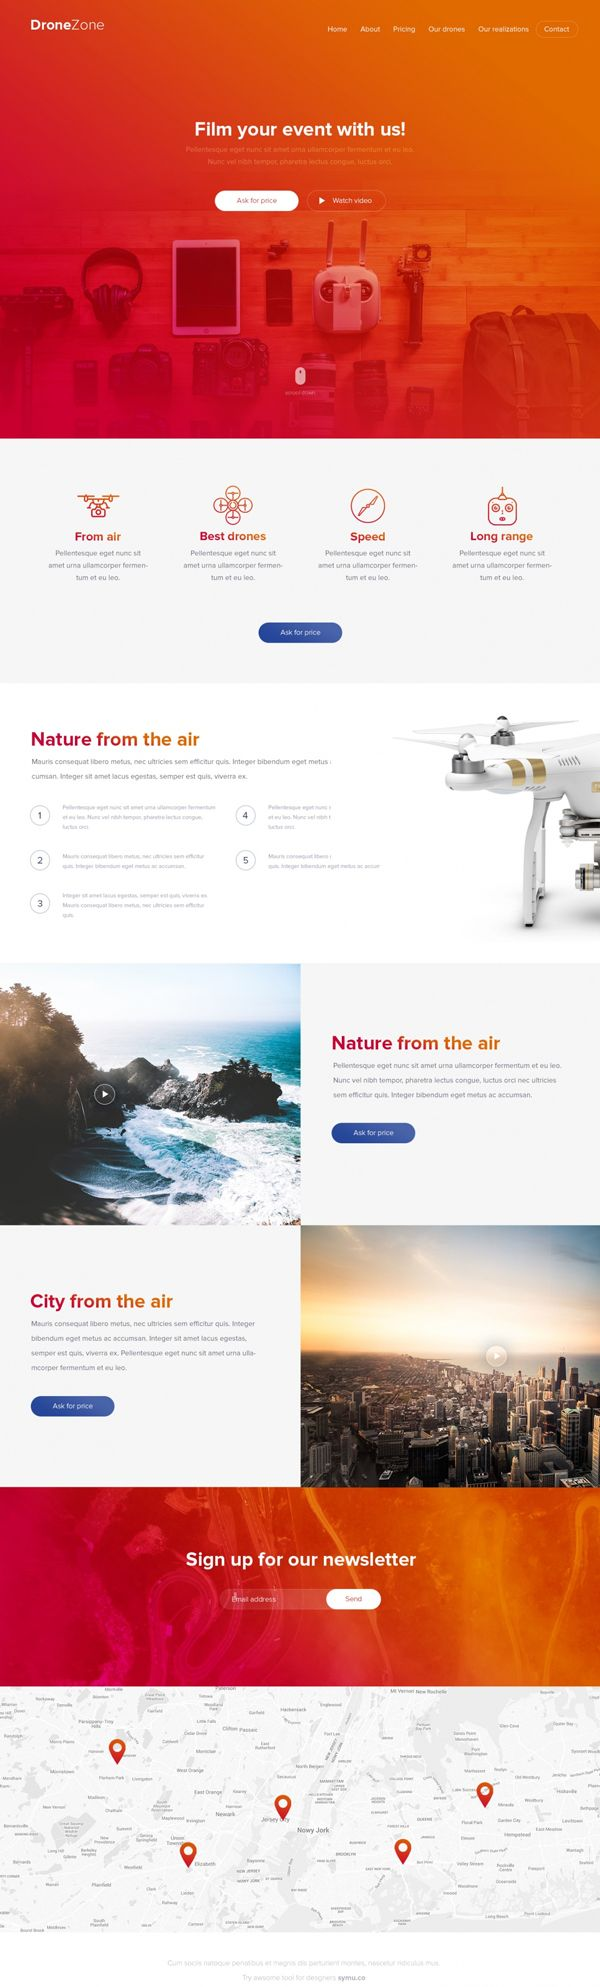 drone zone free psd website template website template pinterest